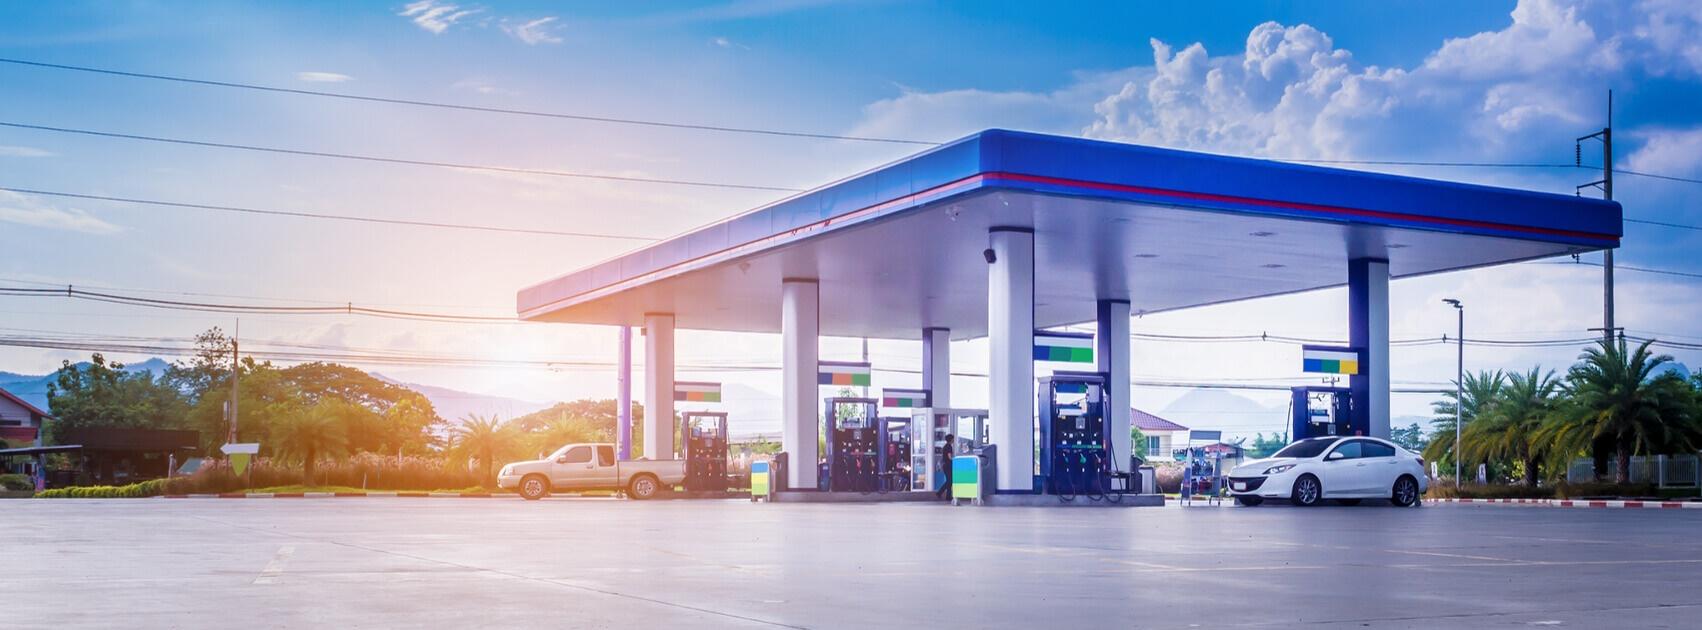 montar-posto-de-gasolina-1.jpg